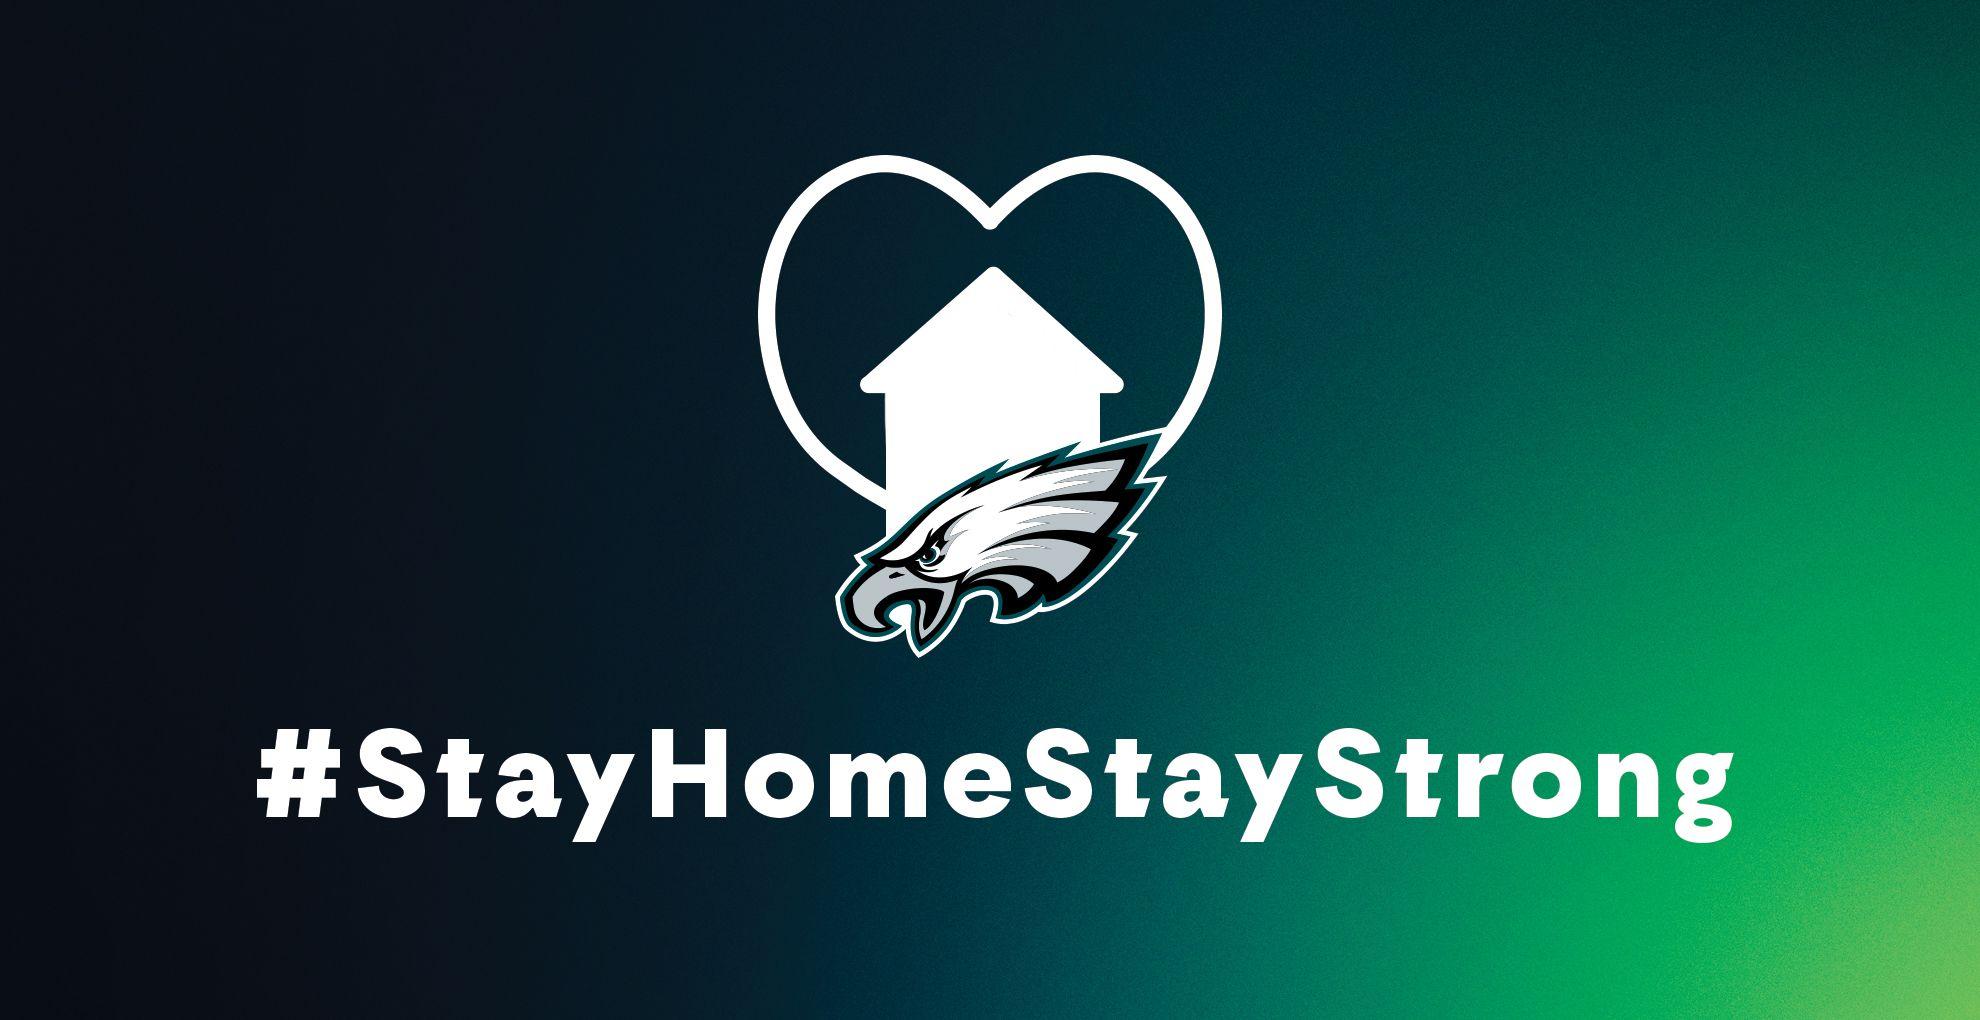 #StayHomeStayStrong